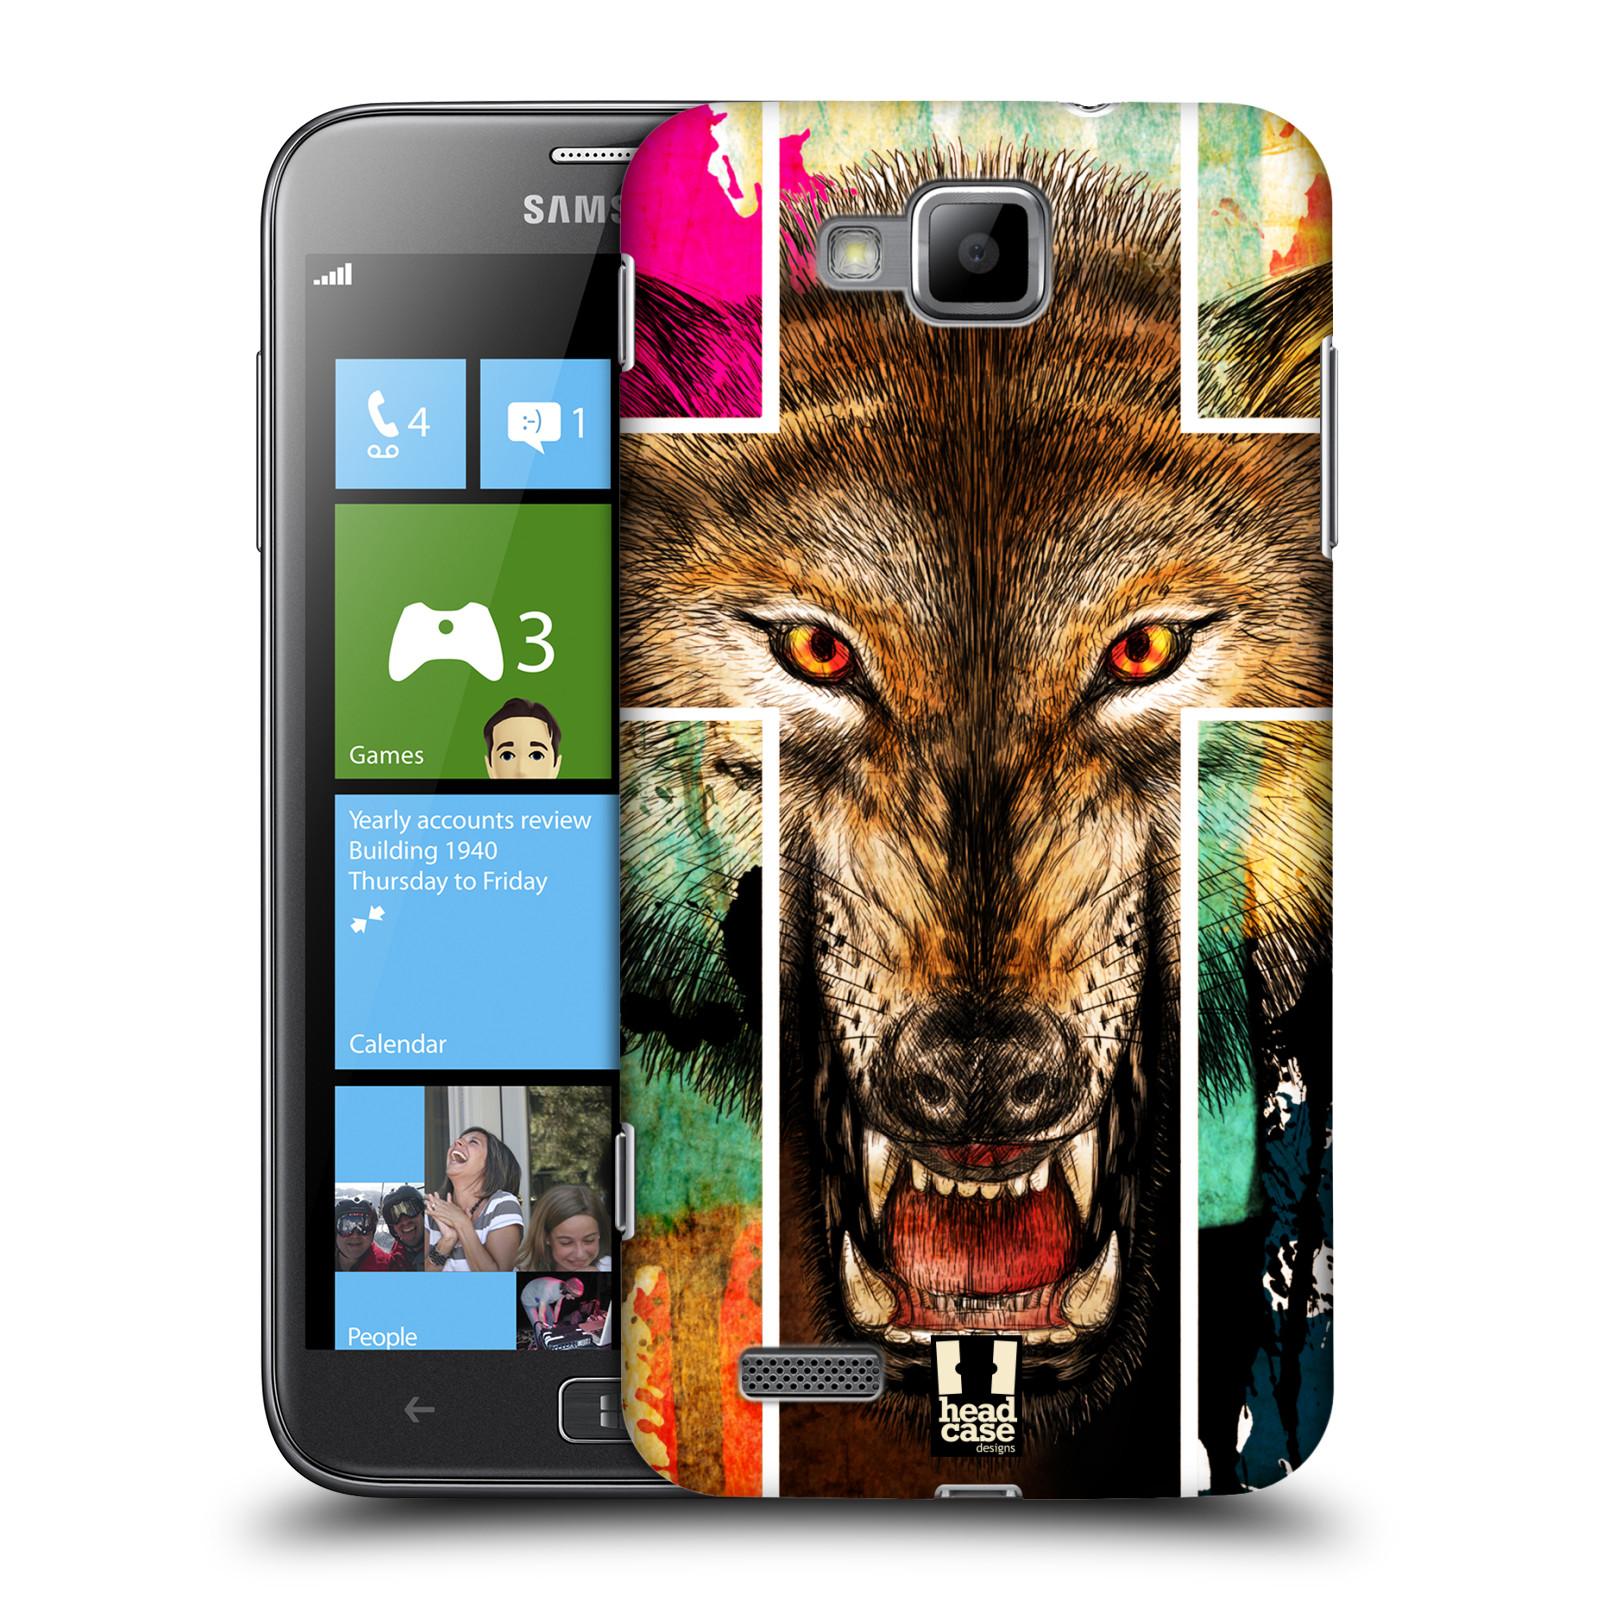 HEAD CASE plastový obal na mobil Samsung ATIV S vzor Kříž a vlk